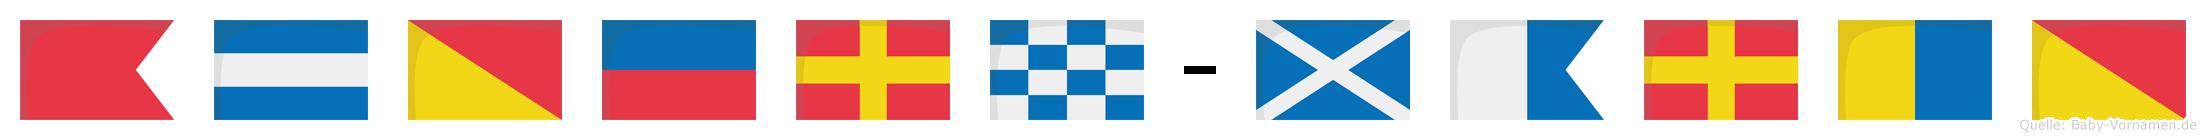 Björn-Marko im Flaggenalphabet